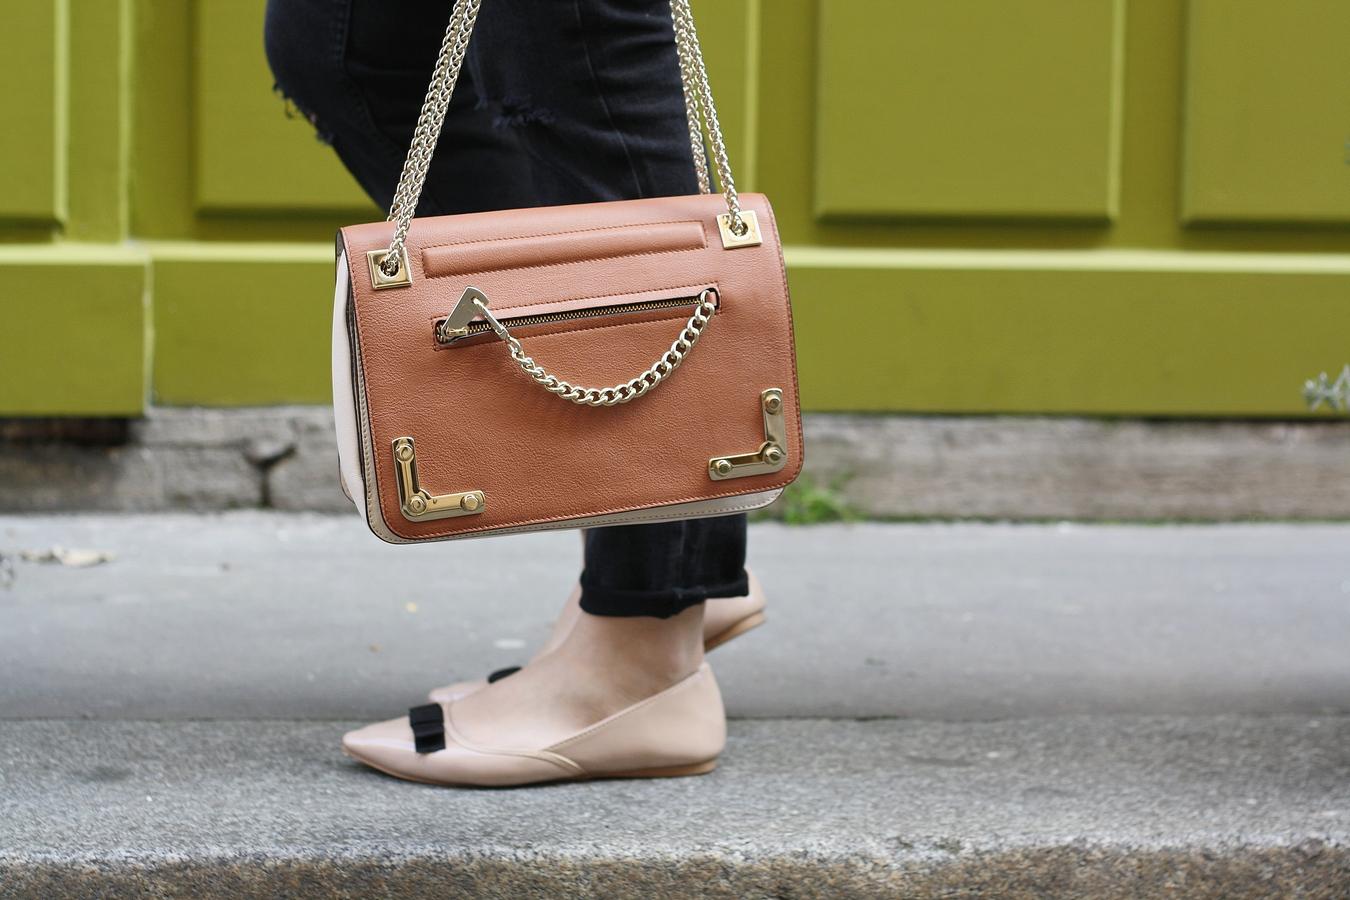 Blog mode femme Paris - Du style, Madame - Streetstyle - look - furla